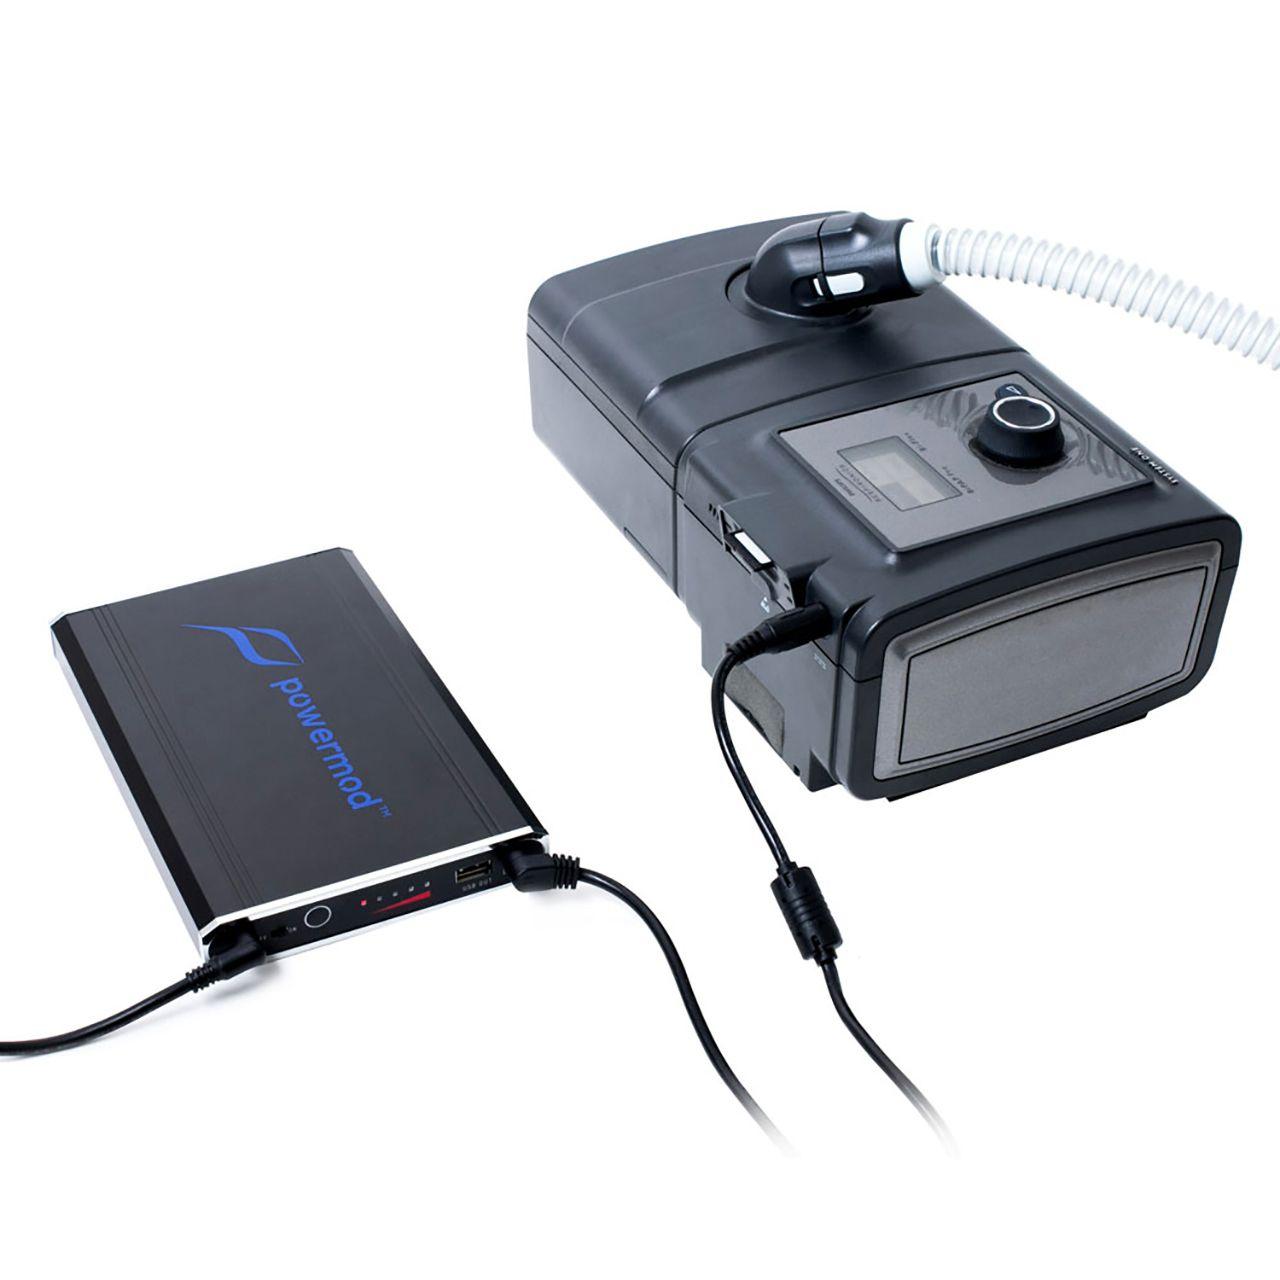 Cpap Bpap Battery 12v Or 24v Resmed Respironics Devilibiss Intelli Pap Cpap Resmed Uninterruptible Power Supplies